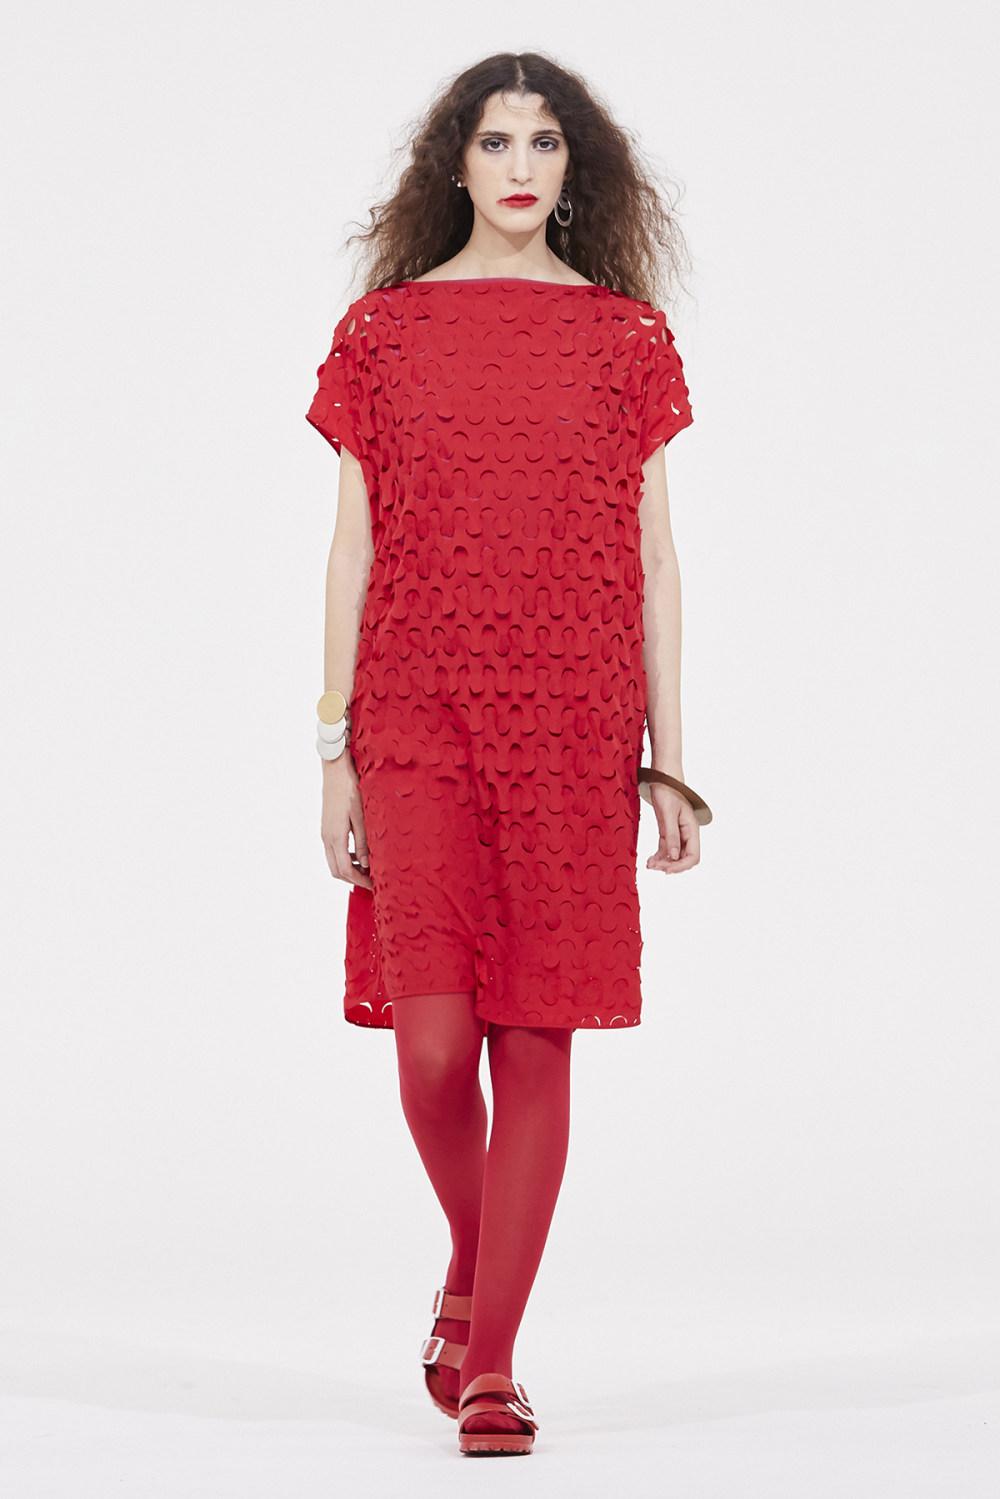 Nicolas Andreas Taralis时装系列技术织物矩形条纹被缝合在一起-10.jpg